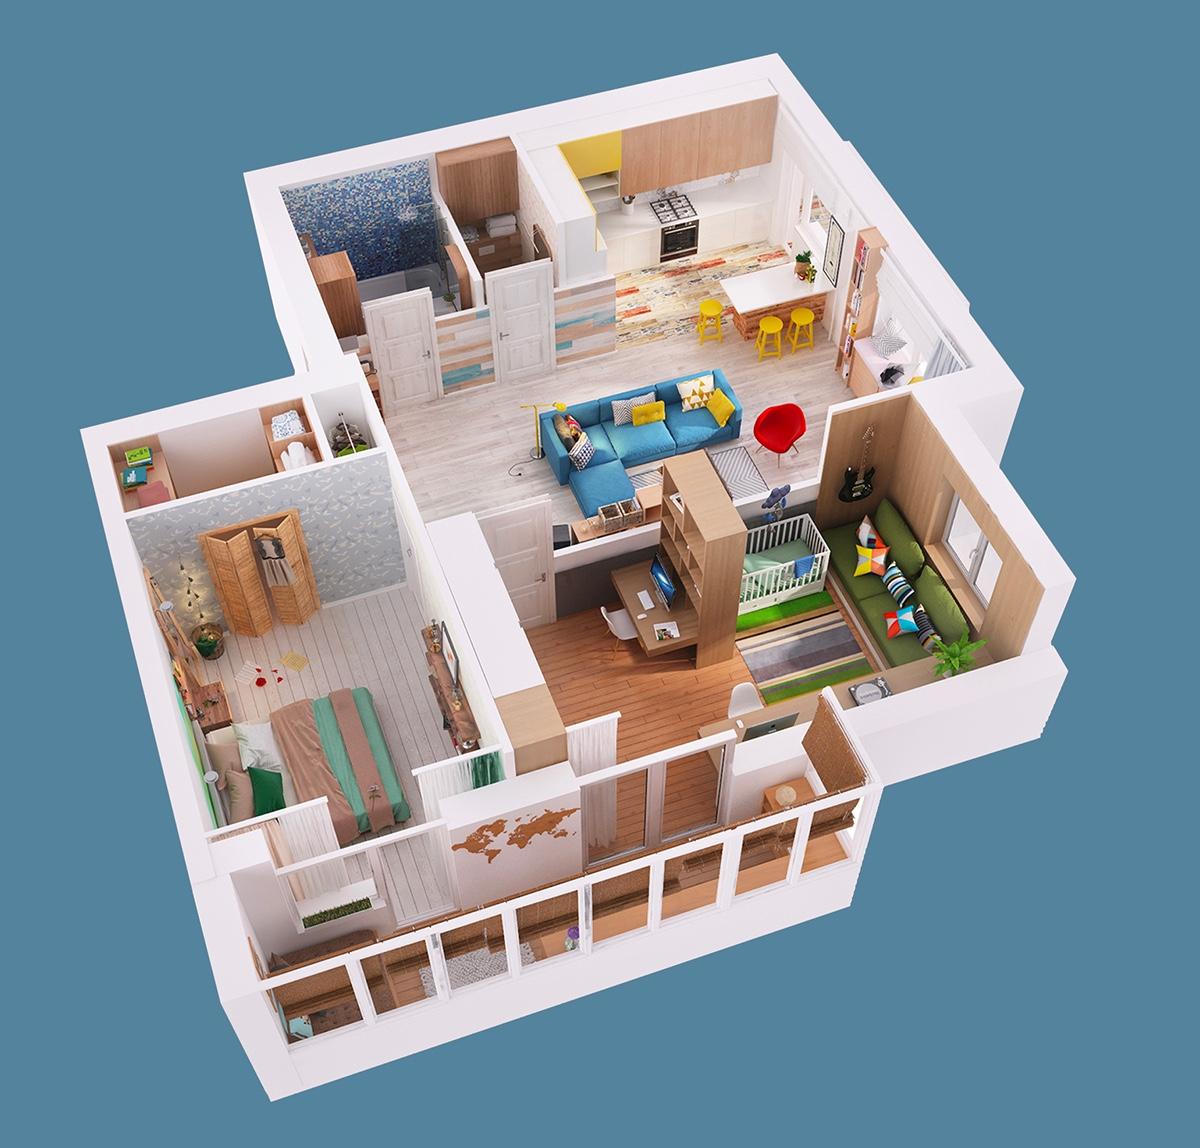 Denah Interior Rumah Kecil 3D